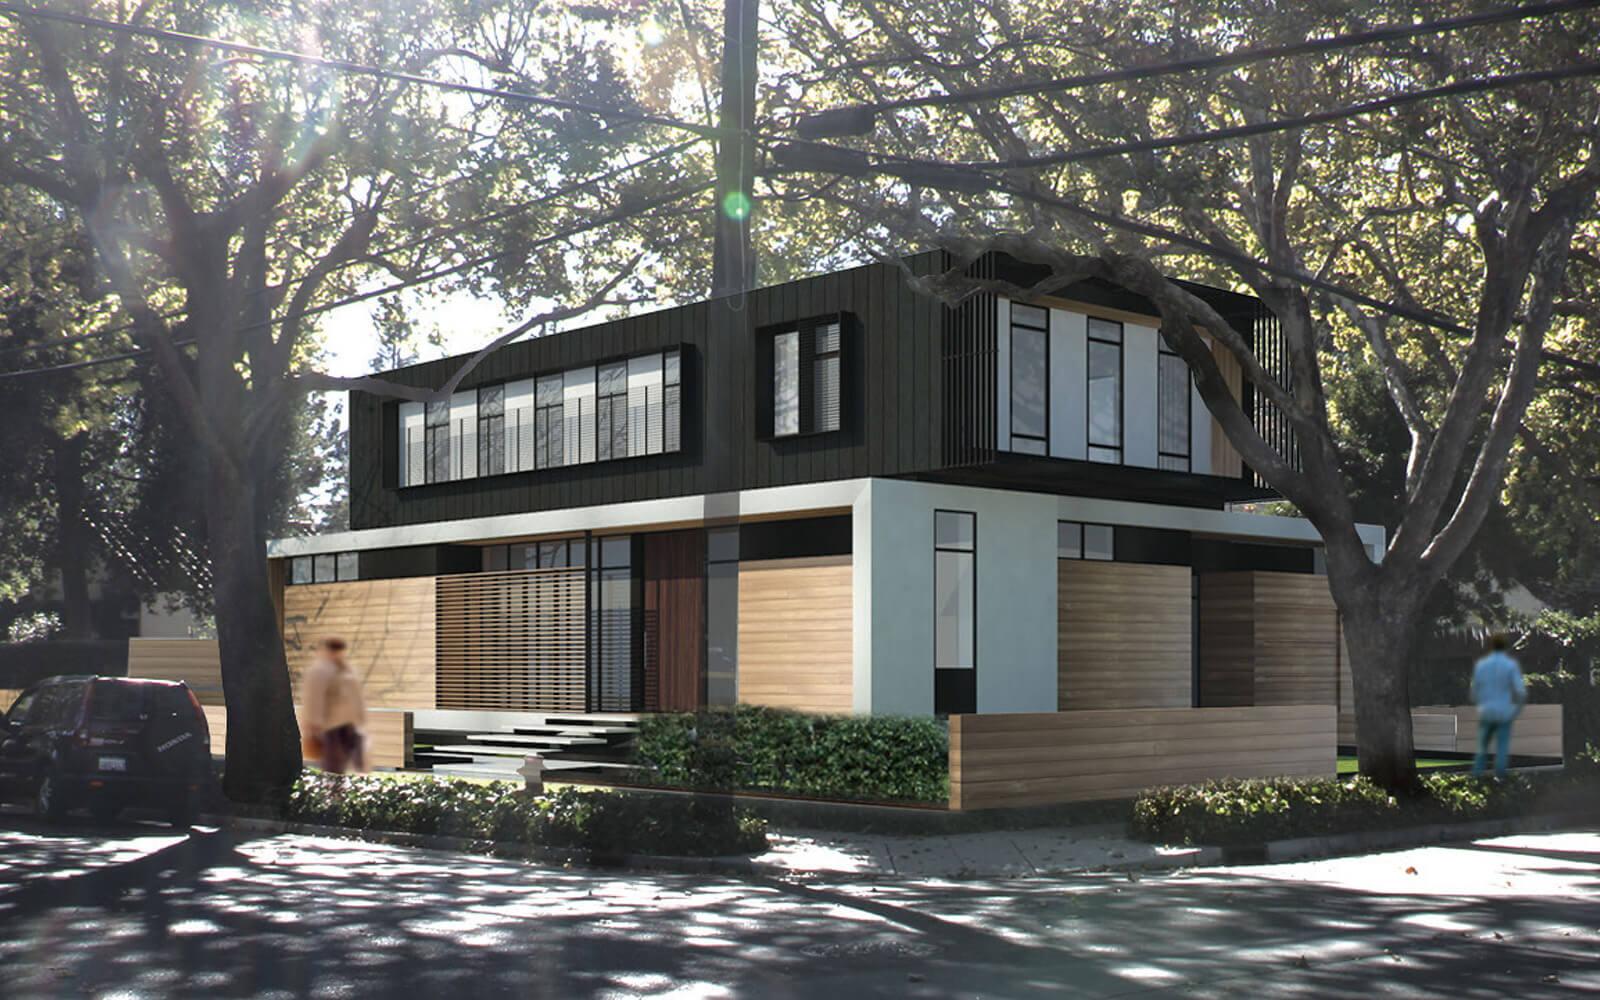 studio vara residential palo alto exterior rendering